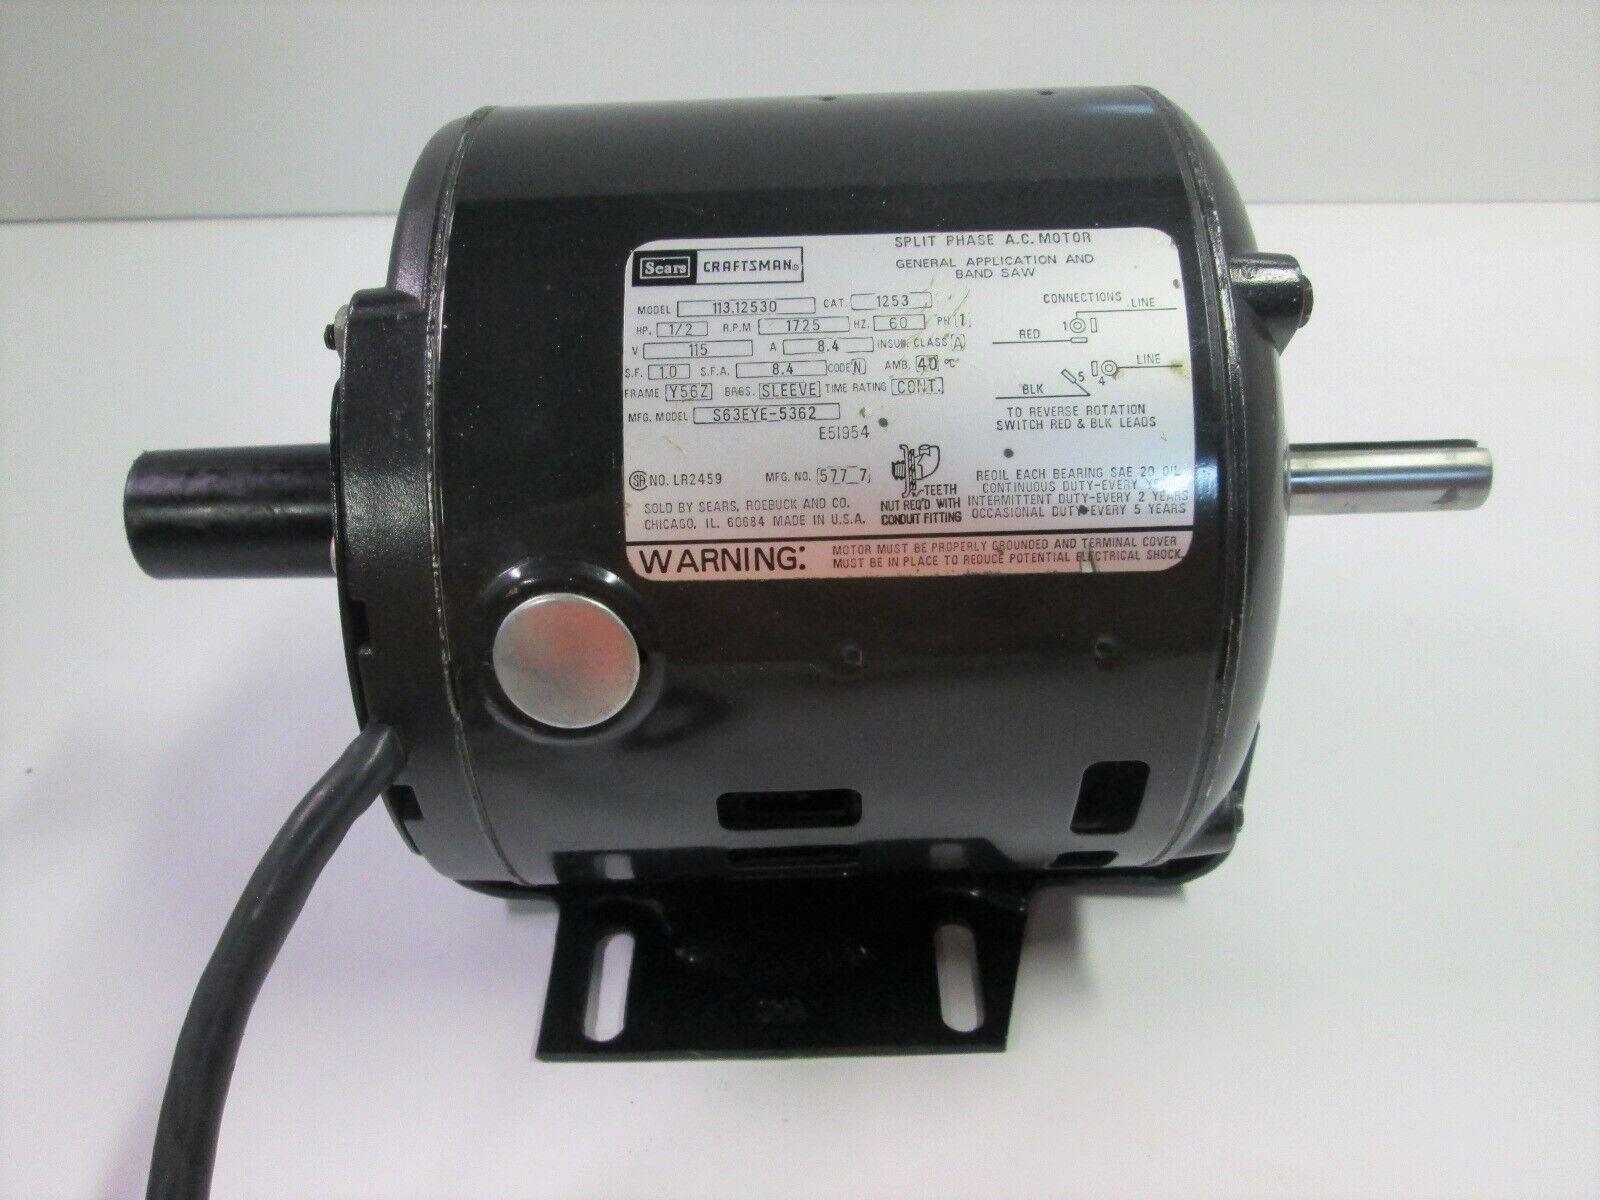 MOTOR /& VFD PACKAGE 1//3 HP 3600 RPM TEFC BROOK MOTOR WITH .50 HP 115V TECO VFD